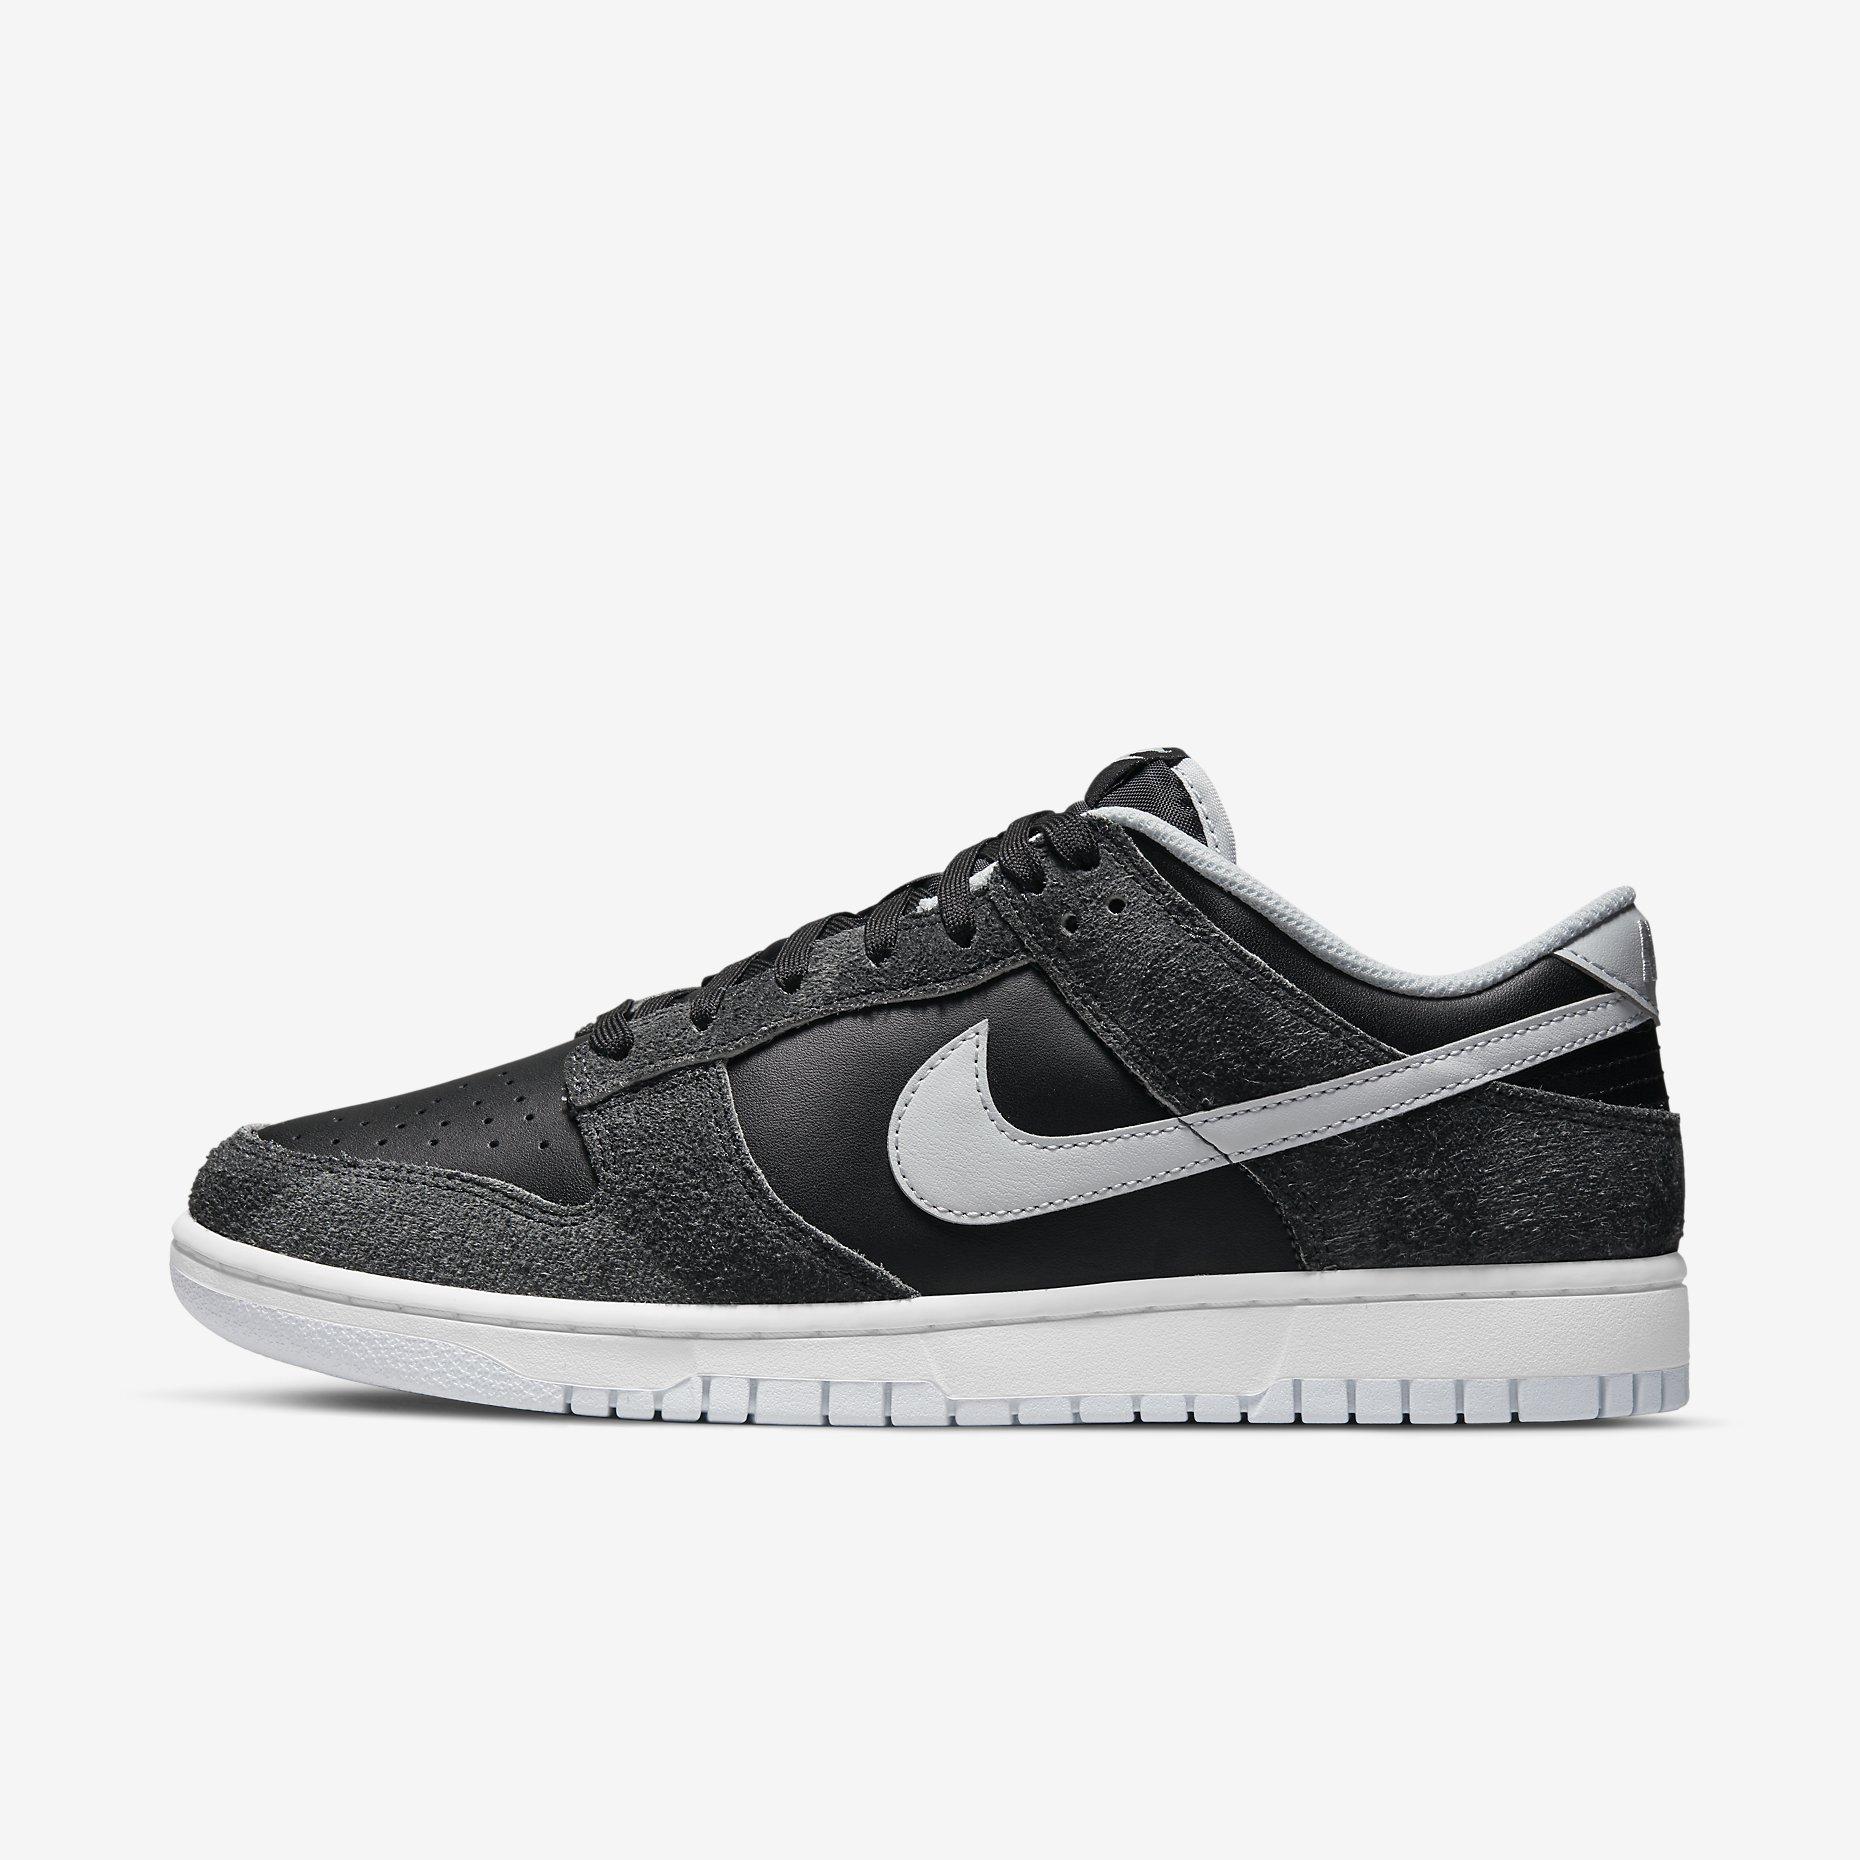 Nike Dunk Low Retro PRM 'Zebra'}